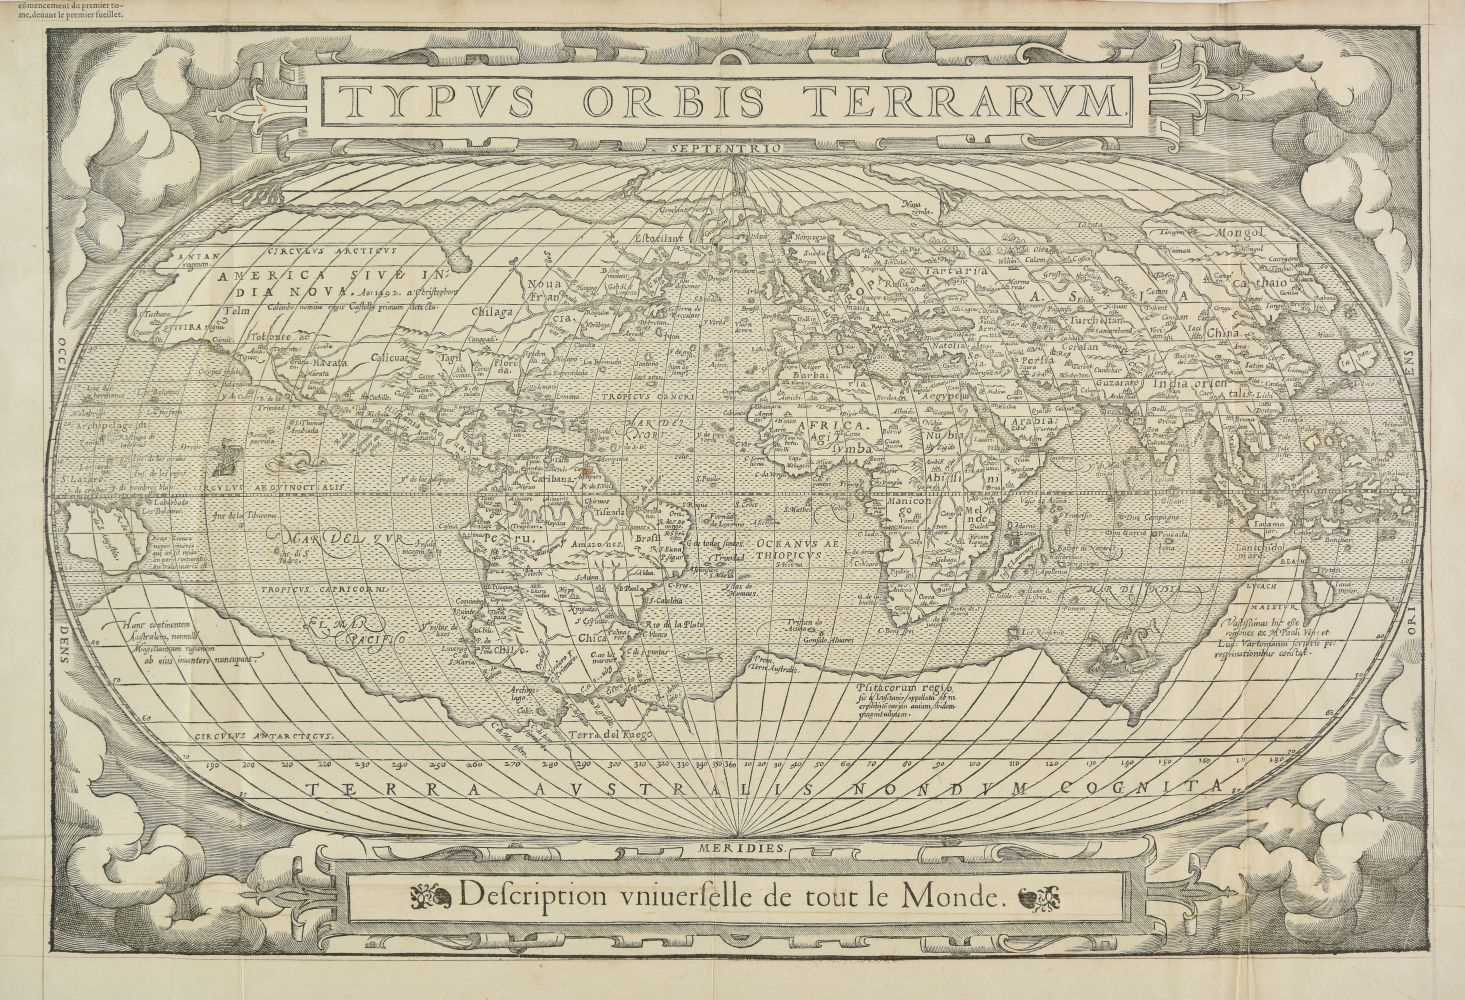 Lot 151 - World. De Belleforest (Francois), Typus Orbis Terrarum, circa 1575